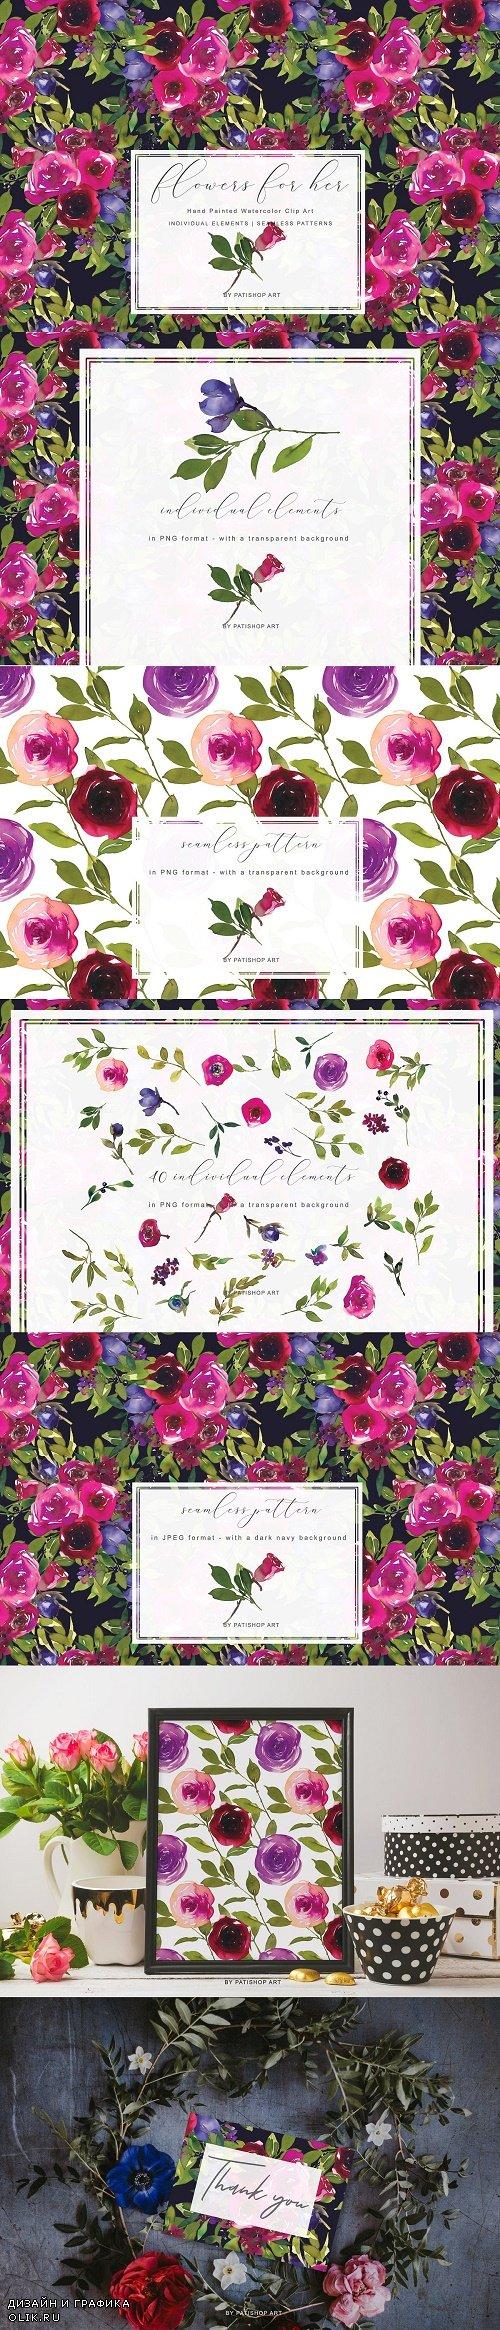 Magenta Watercolor Floral Clipart - 3961886